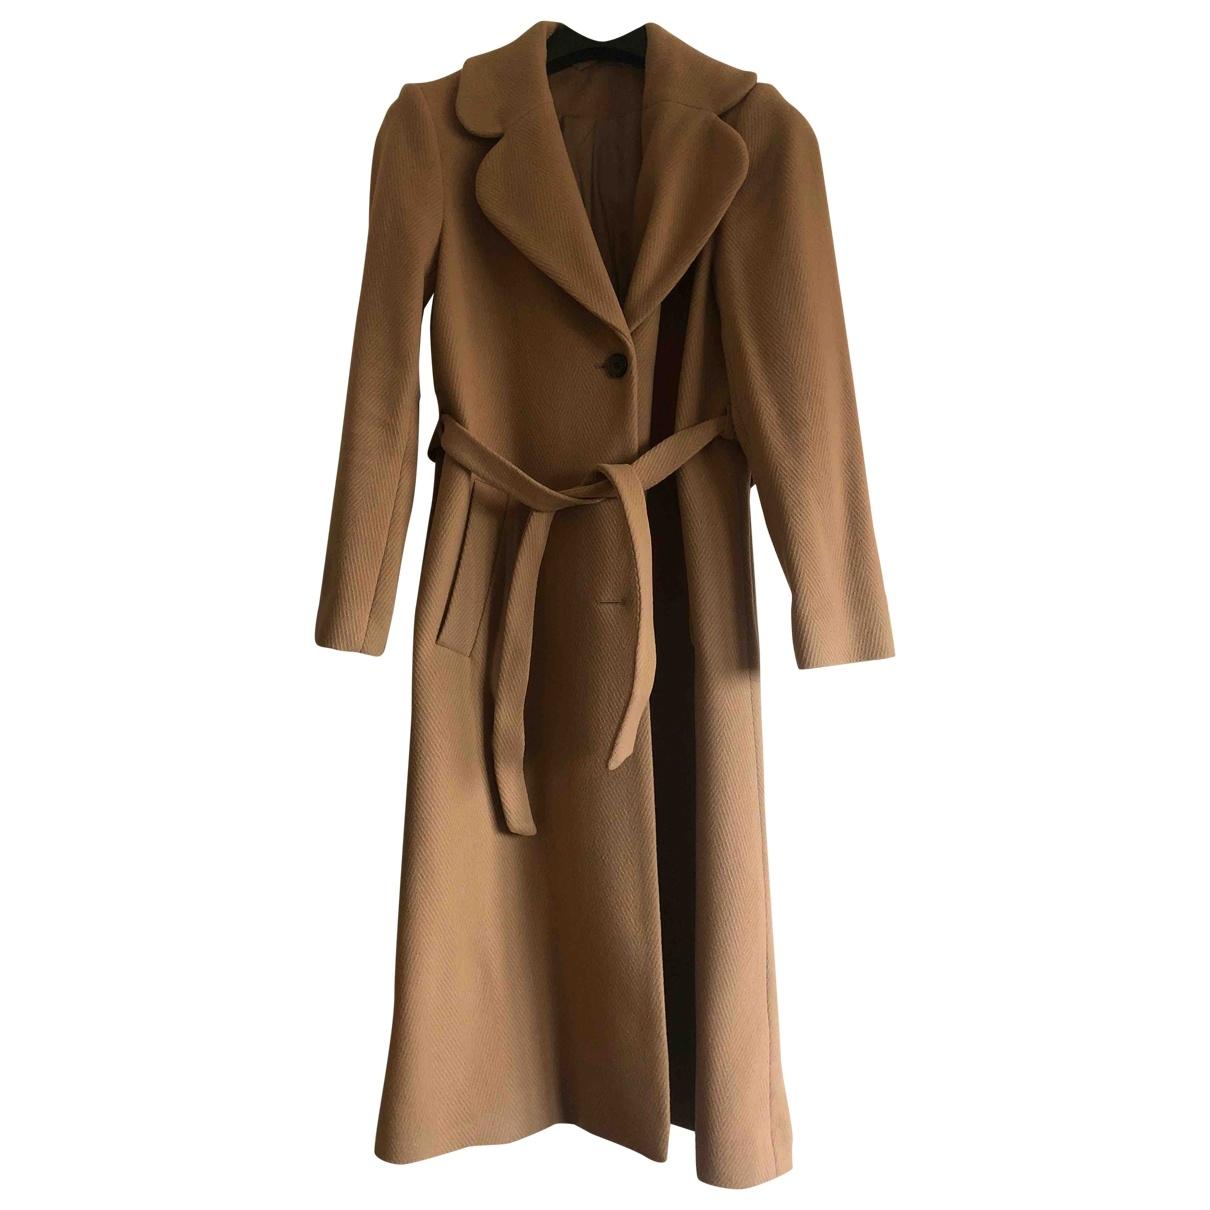 & Stories \N Beige Wool coat for Women 38 FR